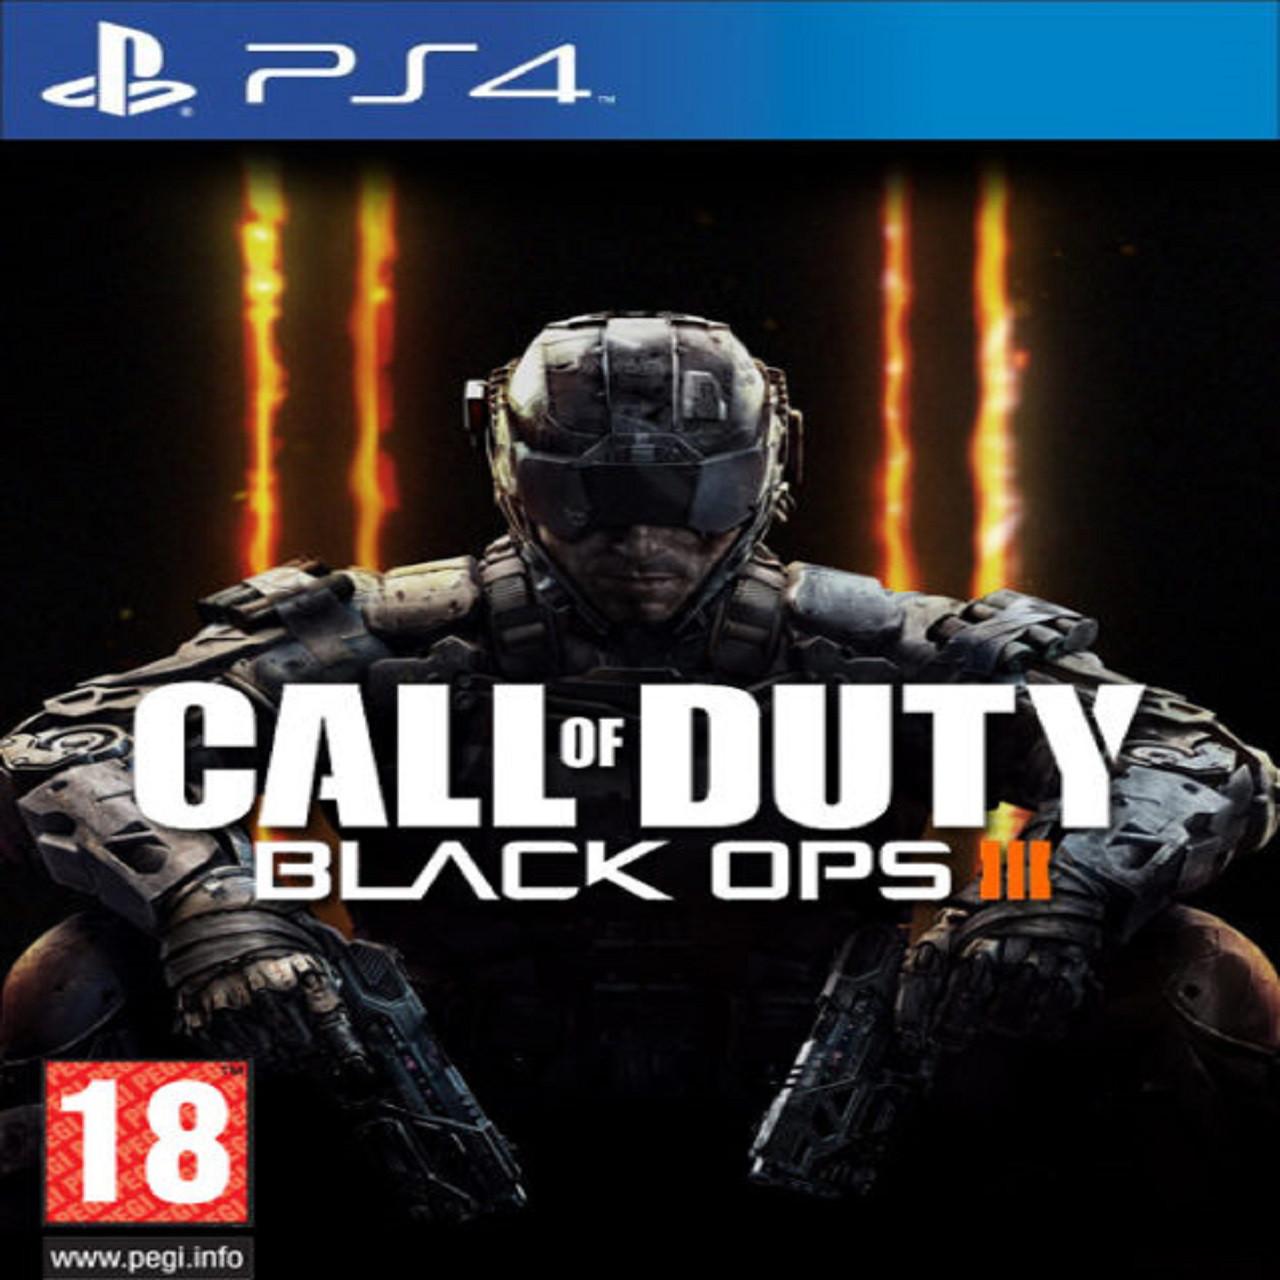 Call of Duty: Black Ops III (SteelBook) (английская версия) PS4 (Б/У)